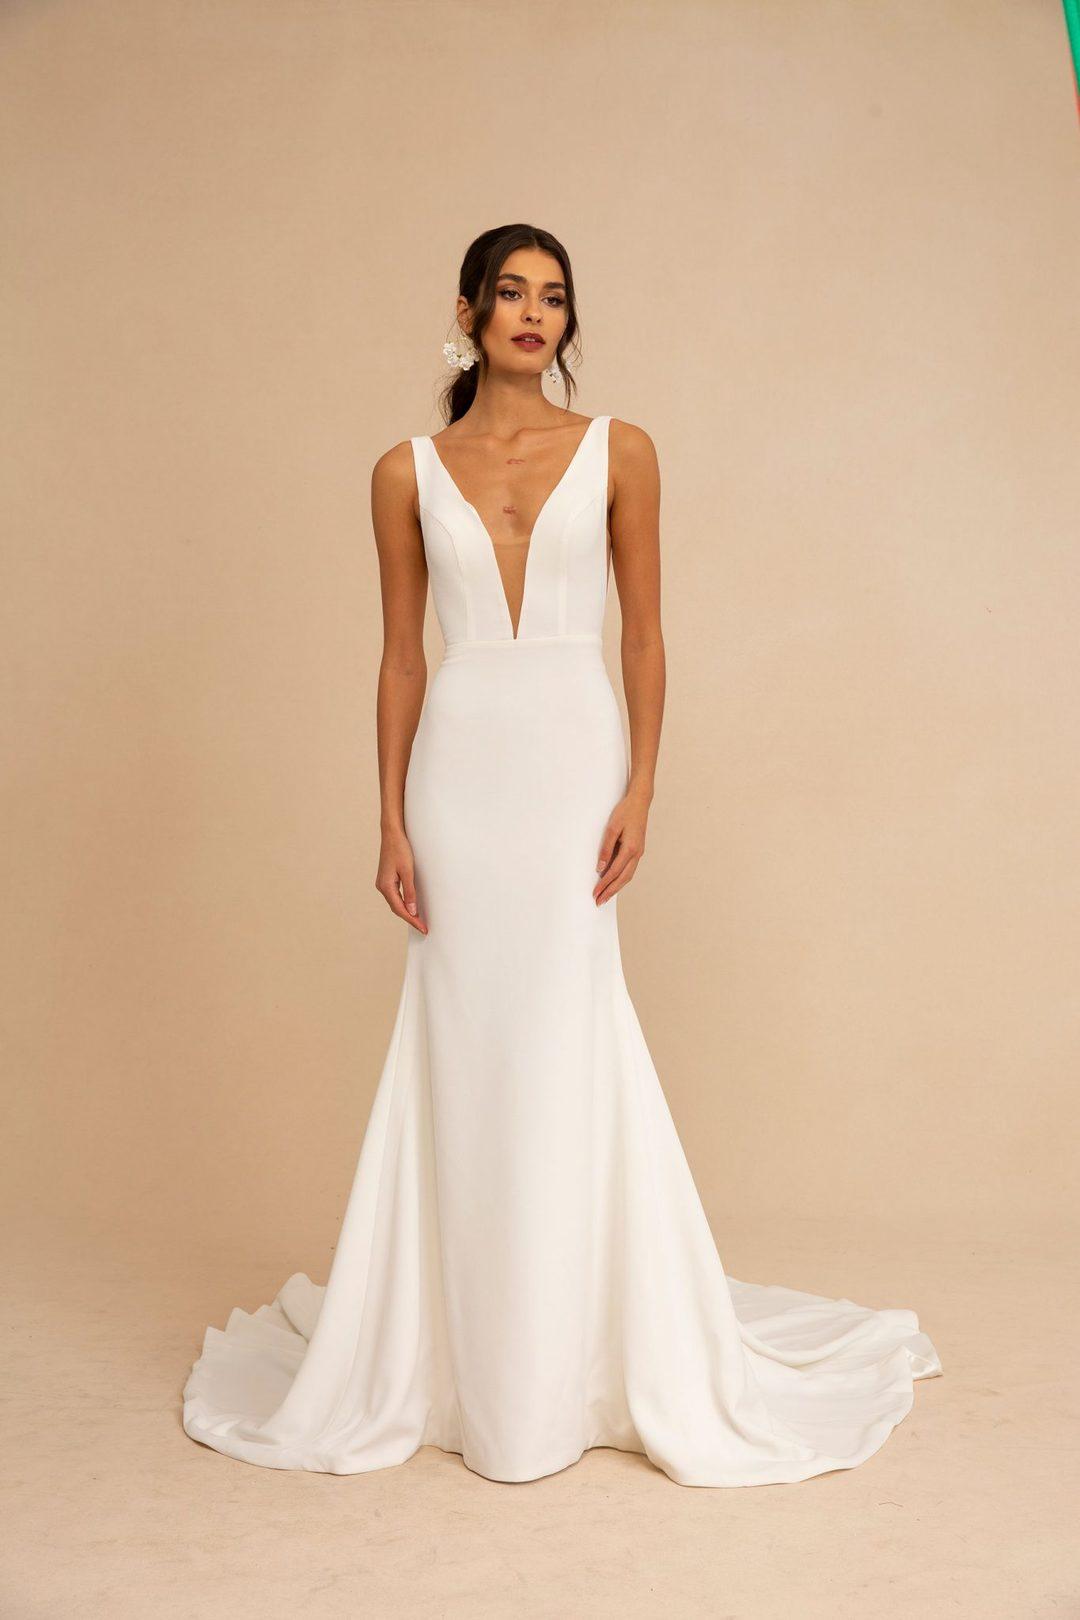 Dress main 2x 1548938311